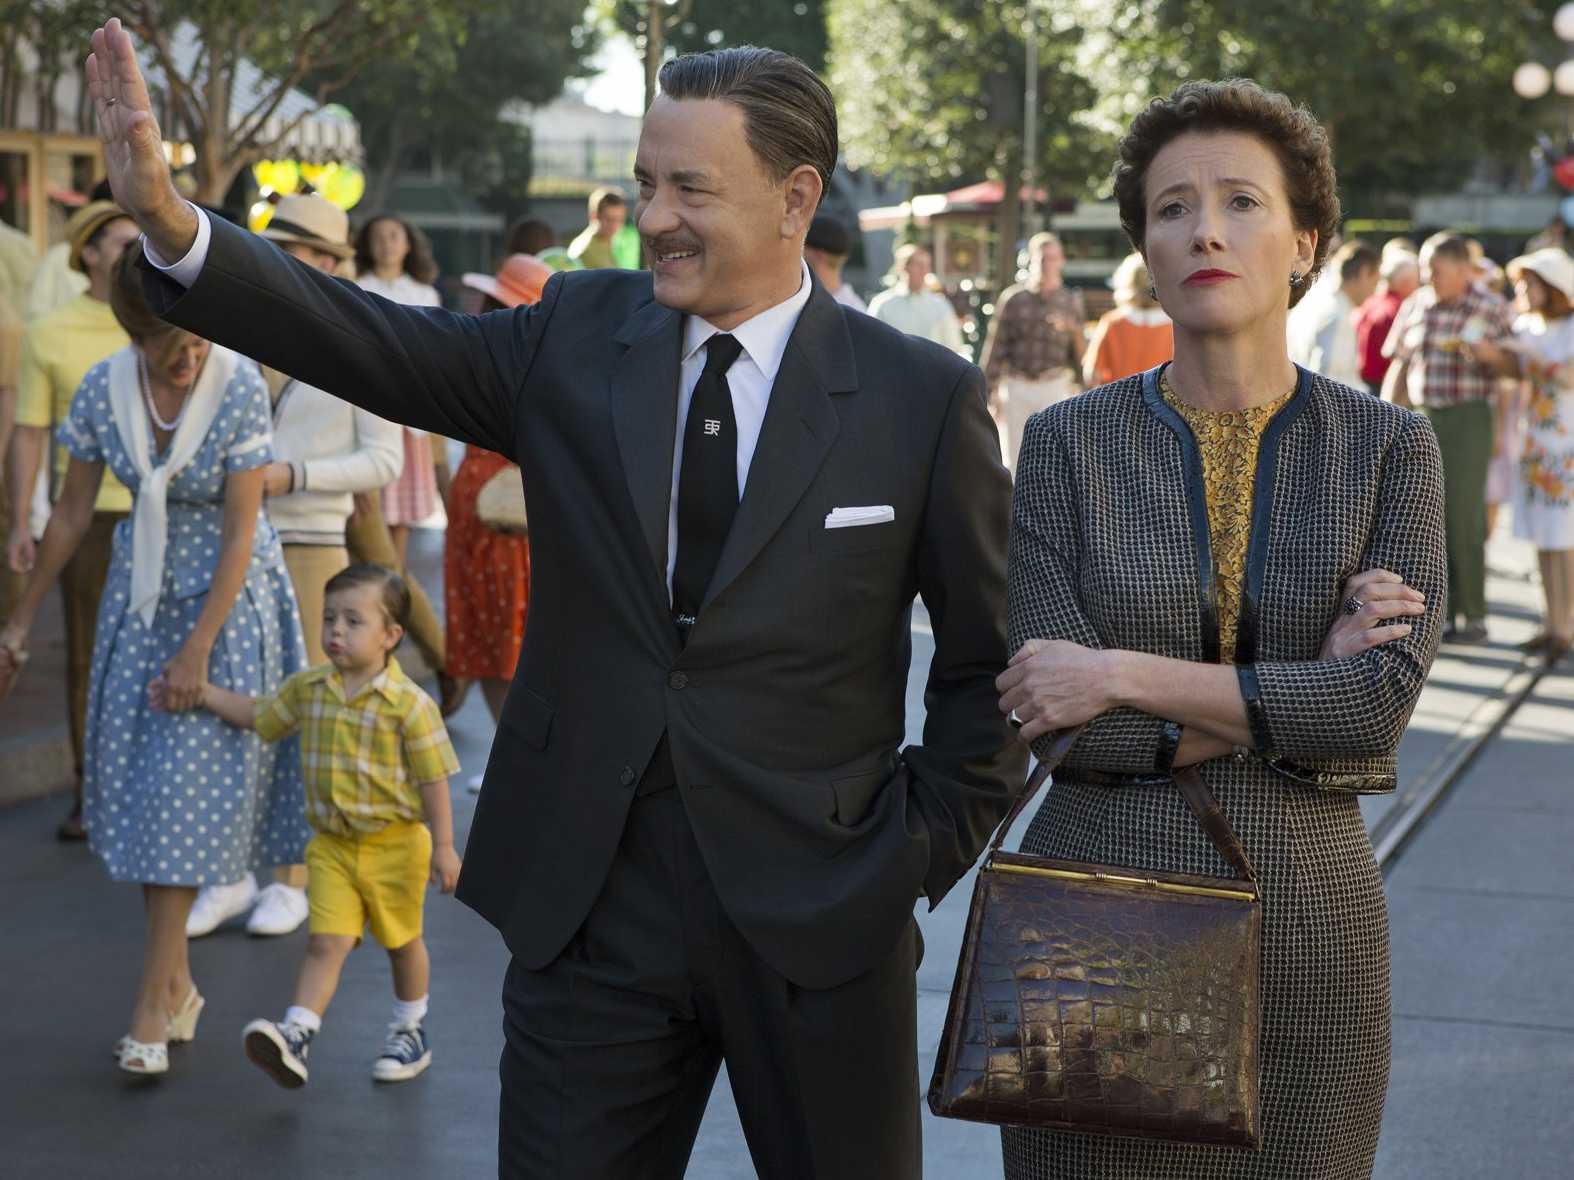 Walt Disney (Tom Hanks) and P.L. Travers (Emma Thompson) walk through Disneyland